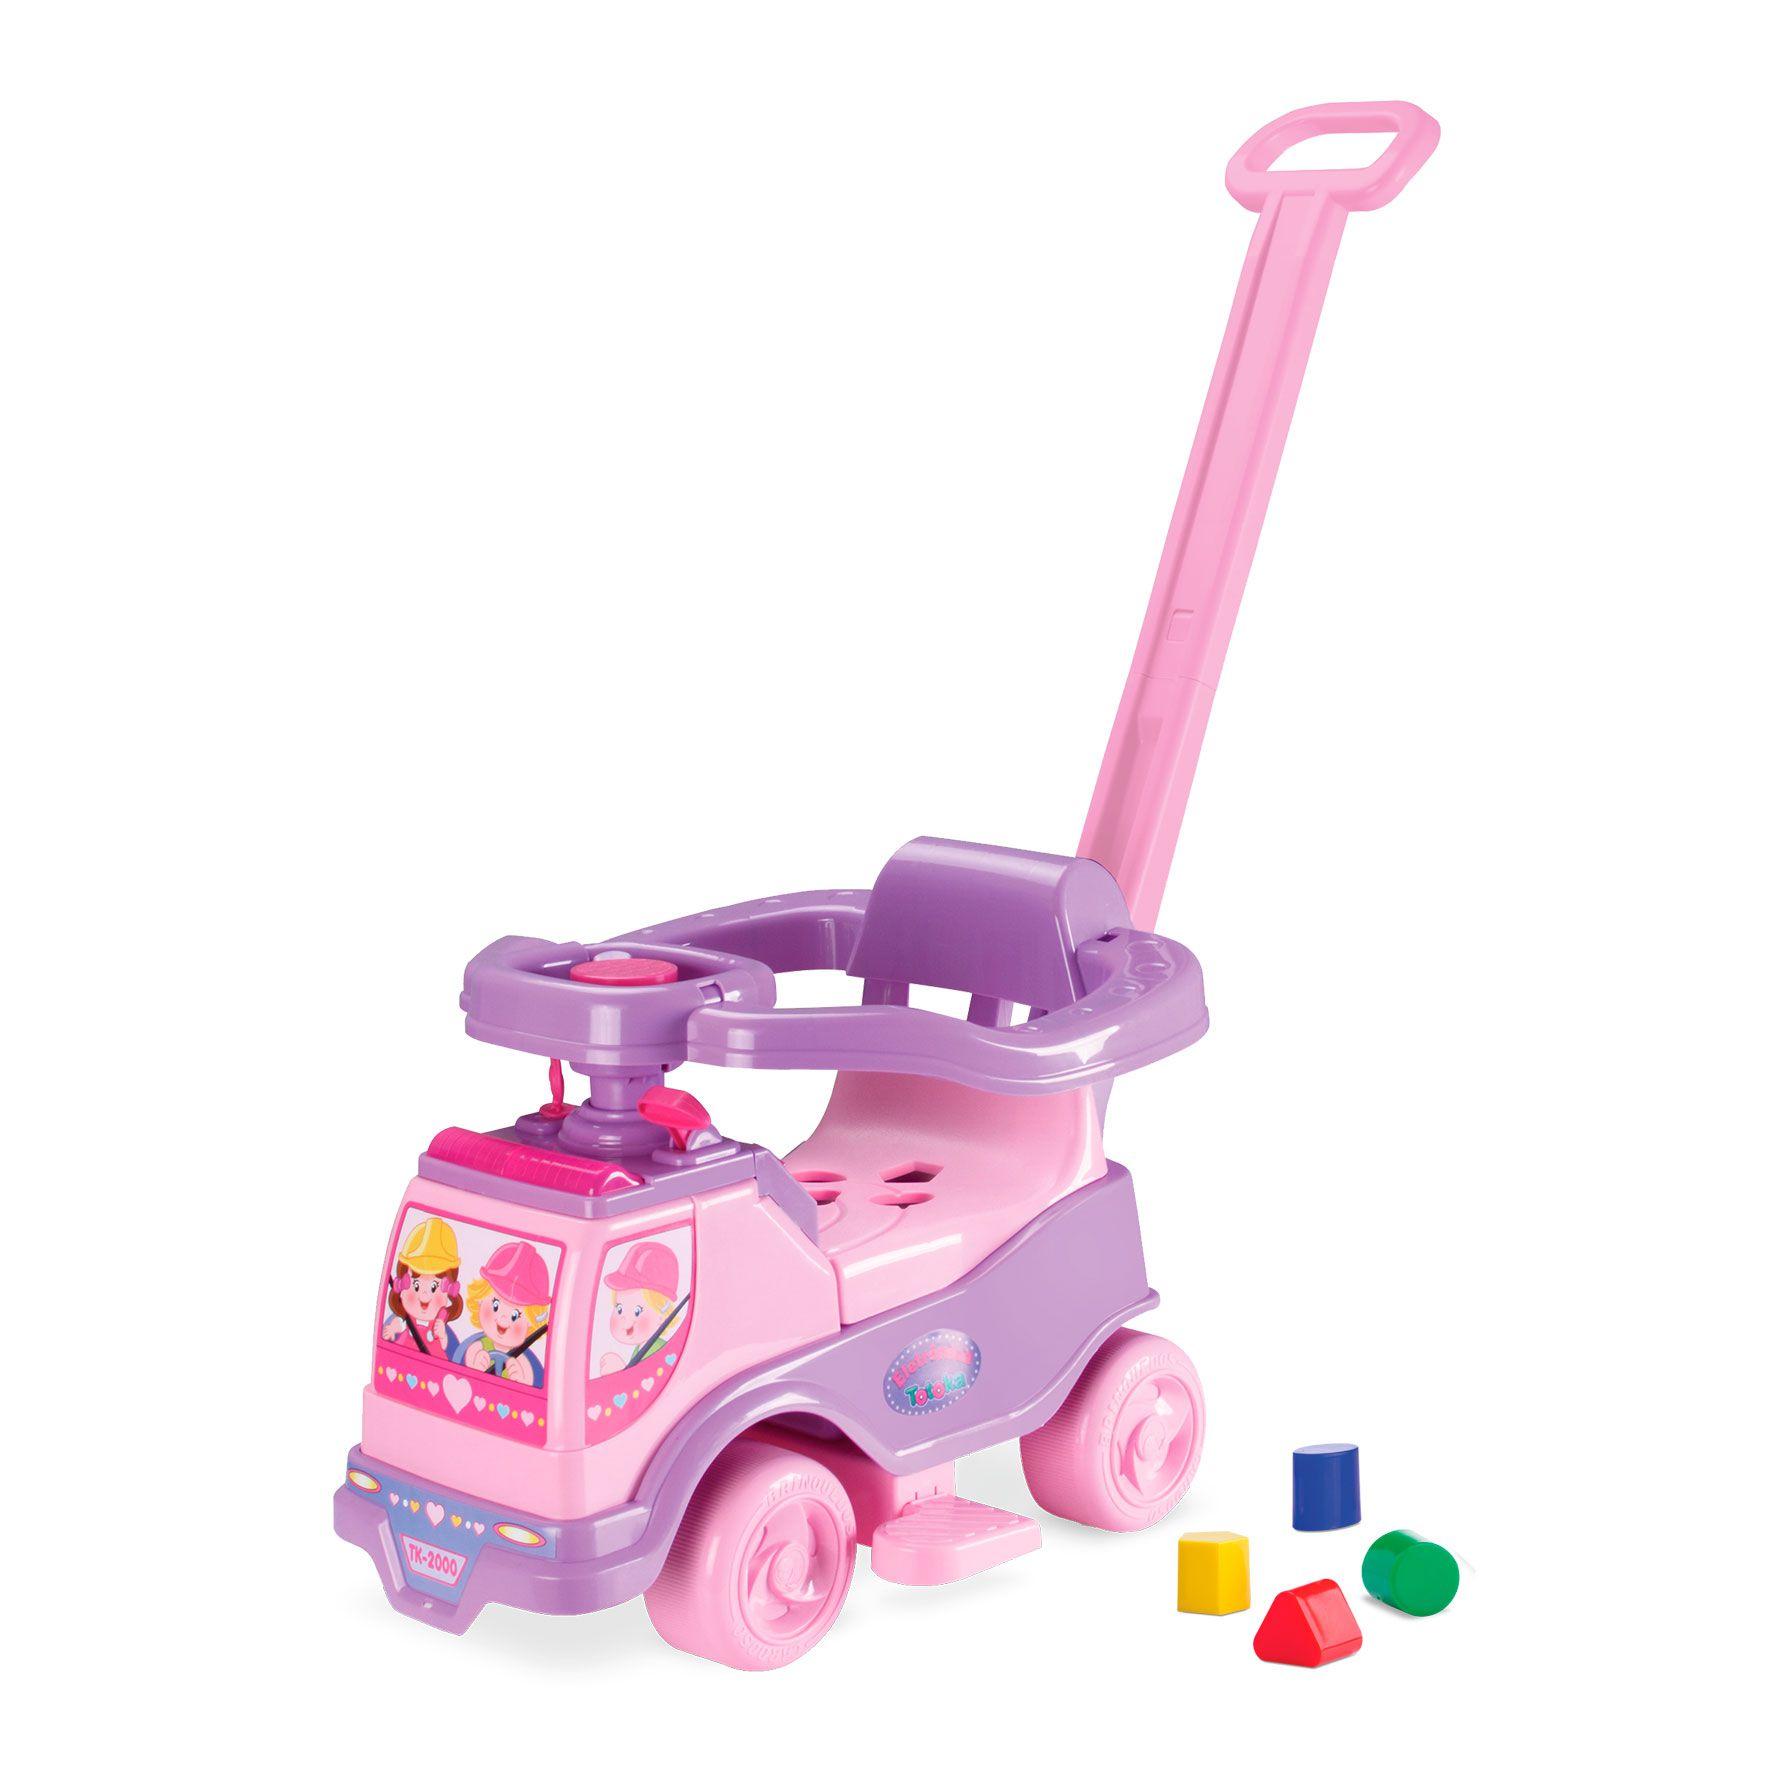 Totoka Plus Menina Eletrônica Com Apoio Cardoso Toys